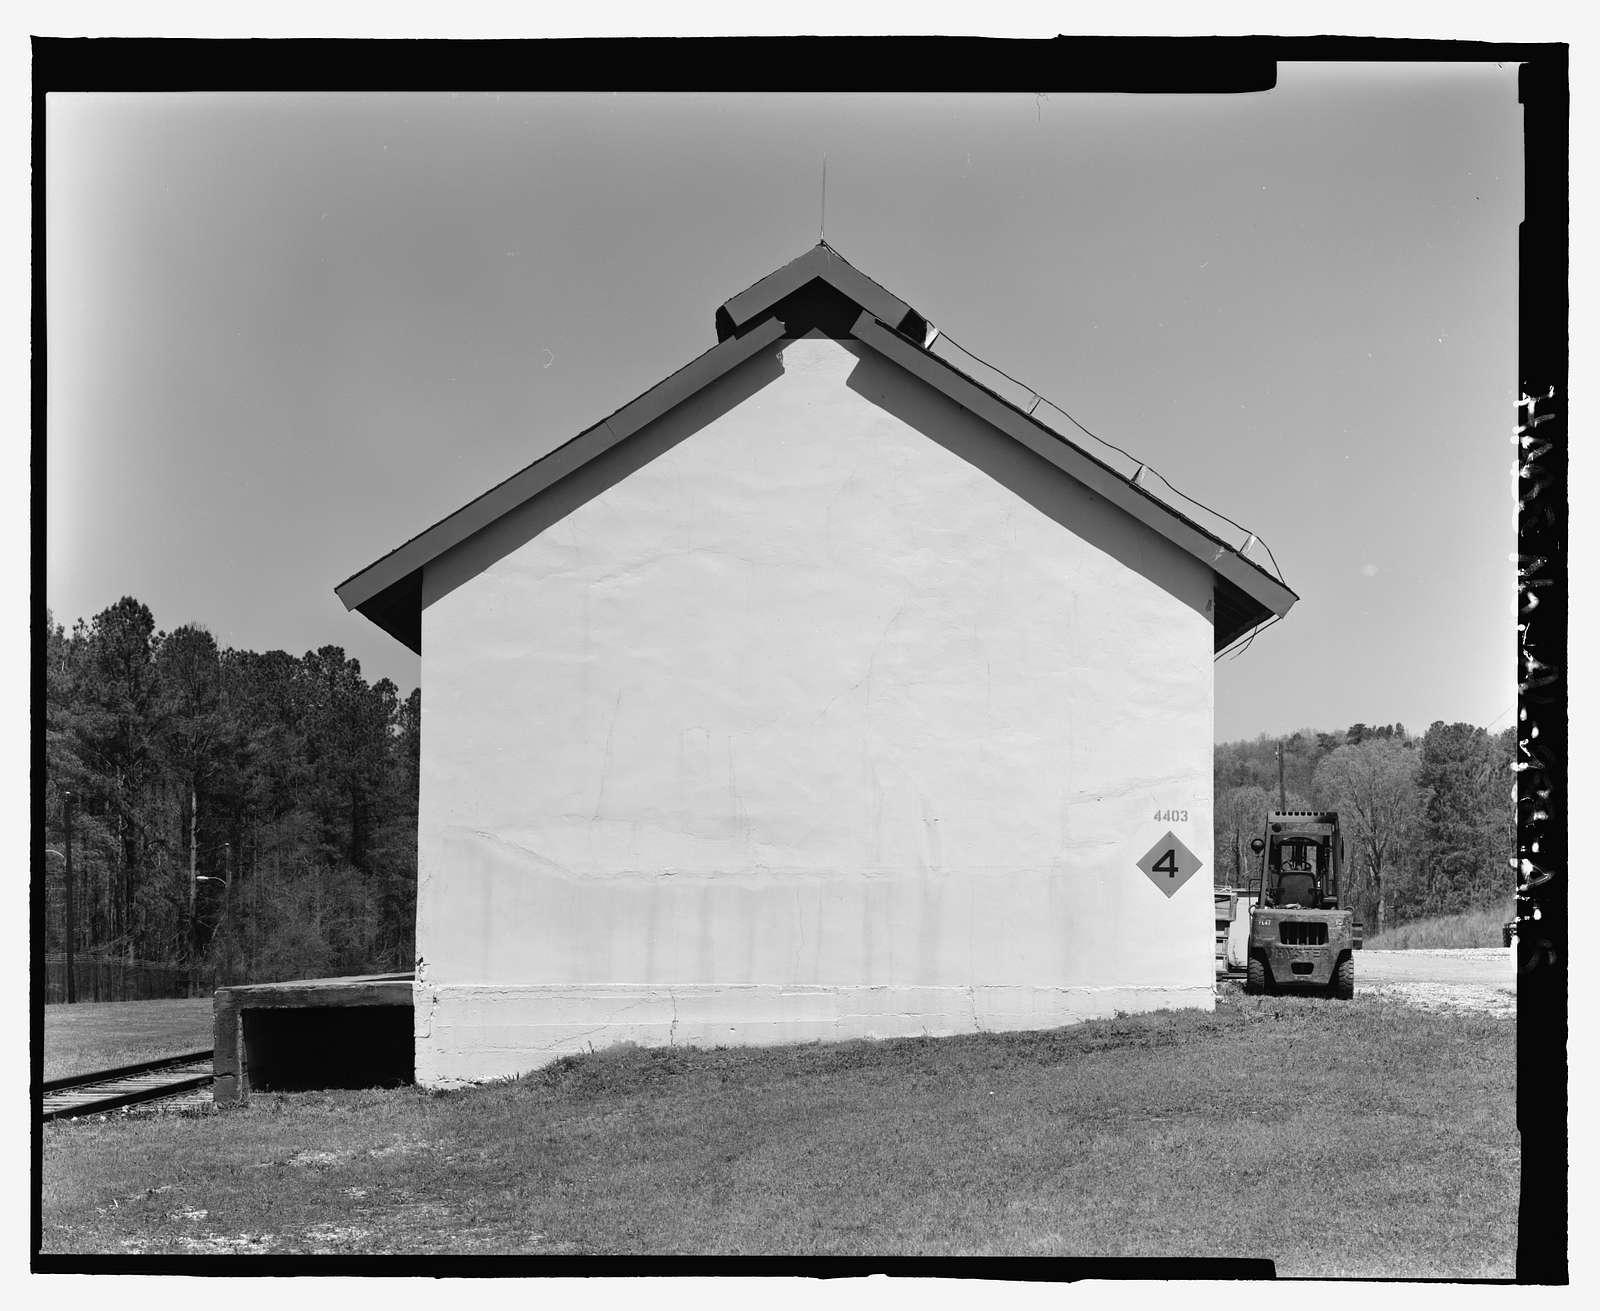 Fort McClellan Ammunition Storage Area, Building No. 4403, Second Avenue (Magazine Road), Anniston, Calhoun County, AL